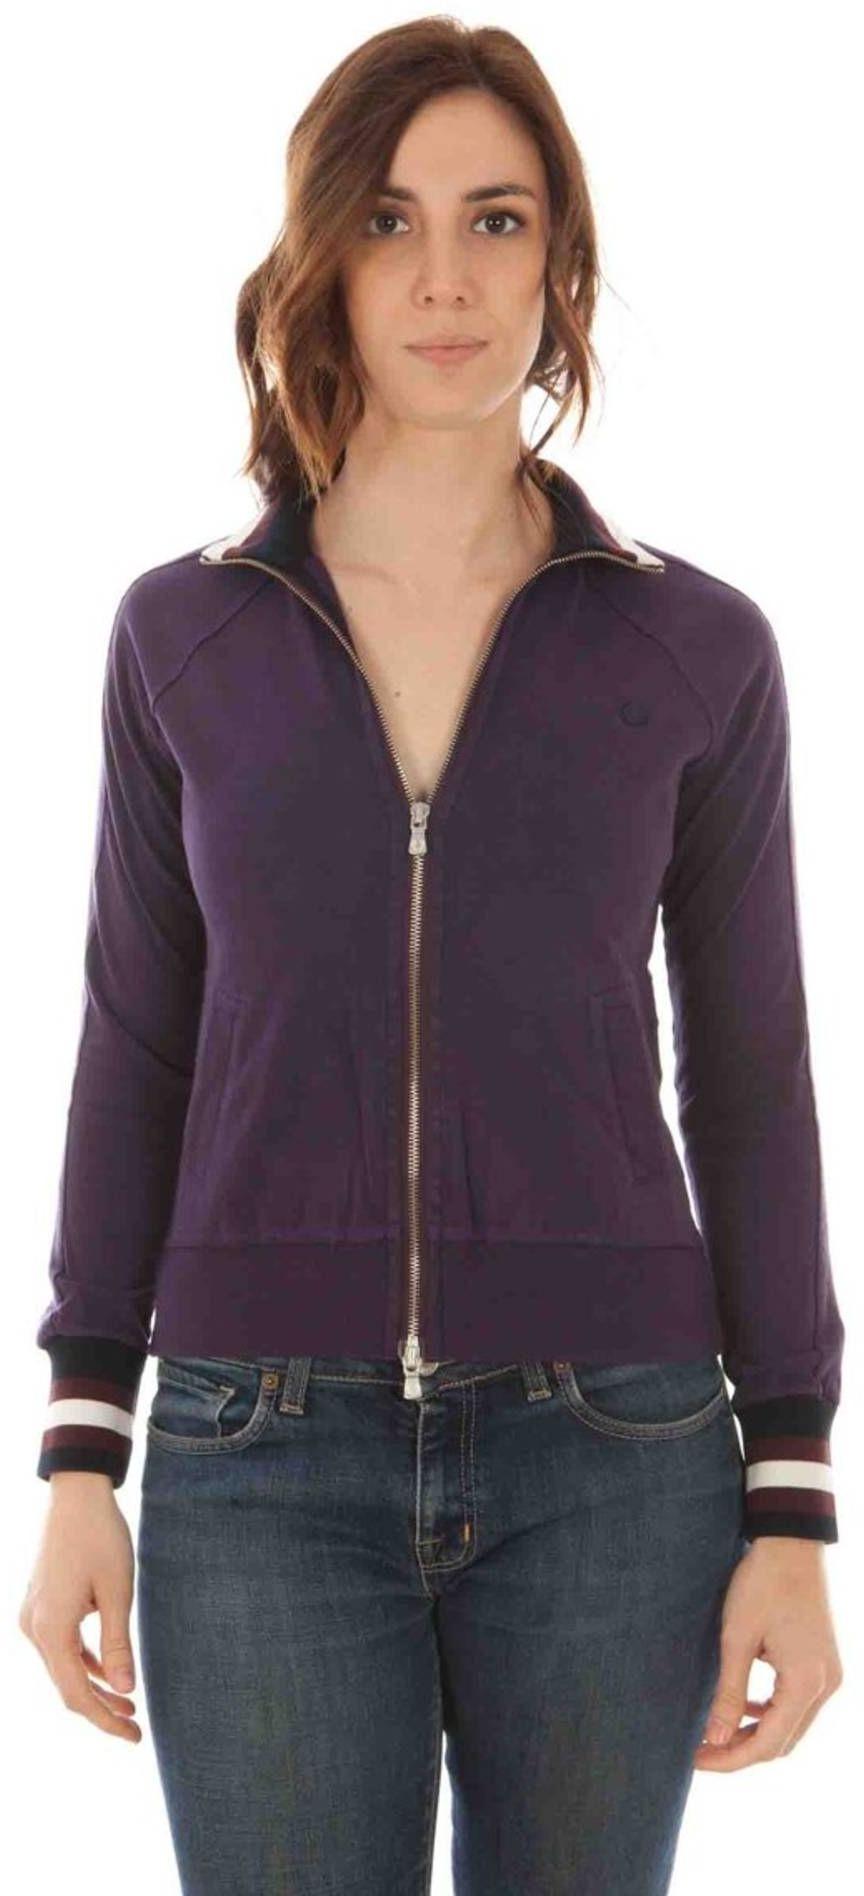 FRED PERRY Sweatshirt with zip Women